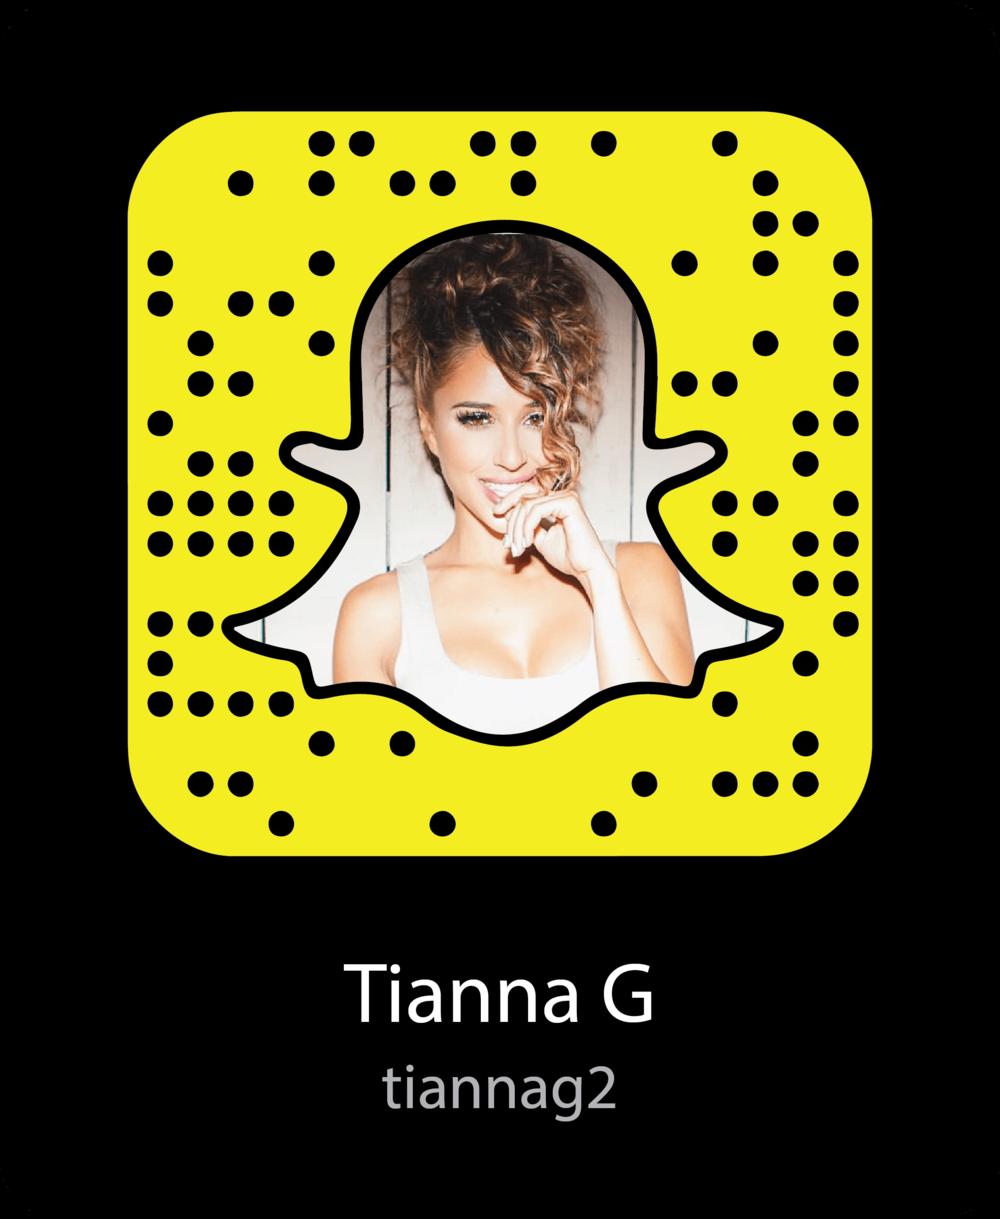 tianna-g-sexy-snapchat-snapcode